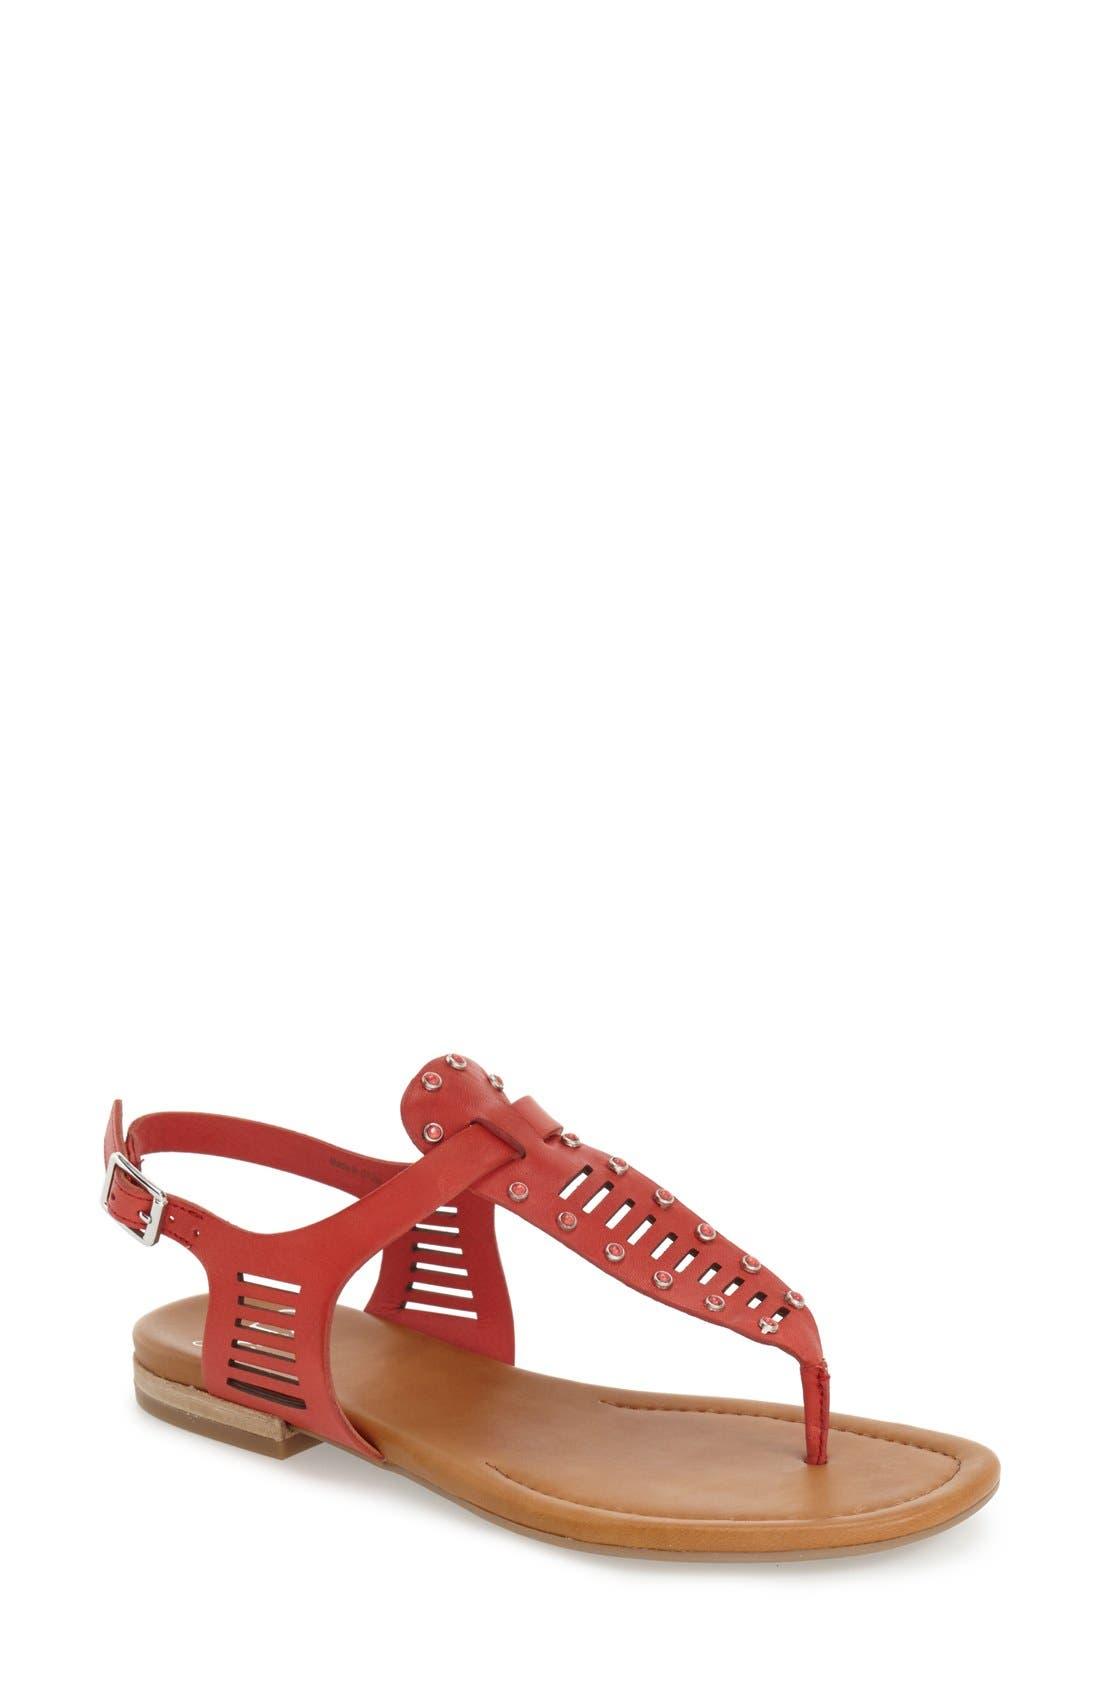 Alternate Image 1 Selected - SARTO by Franco Sarto 'Sarita' Thong Sandal (Women)